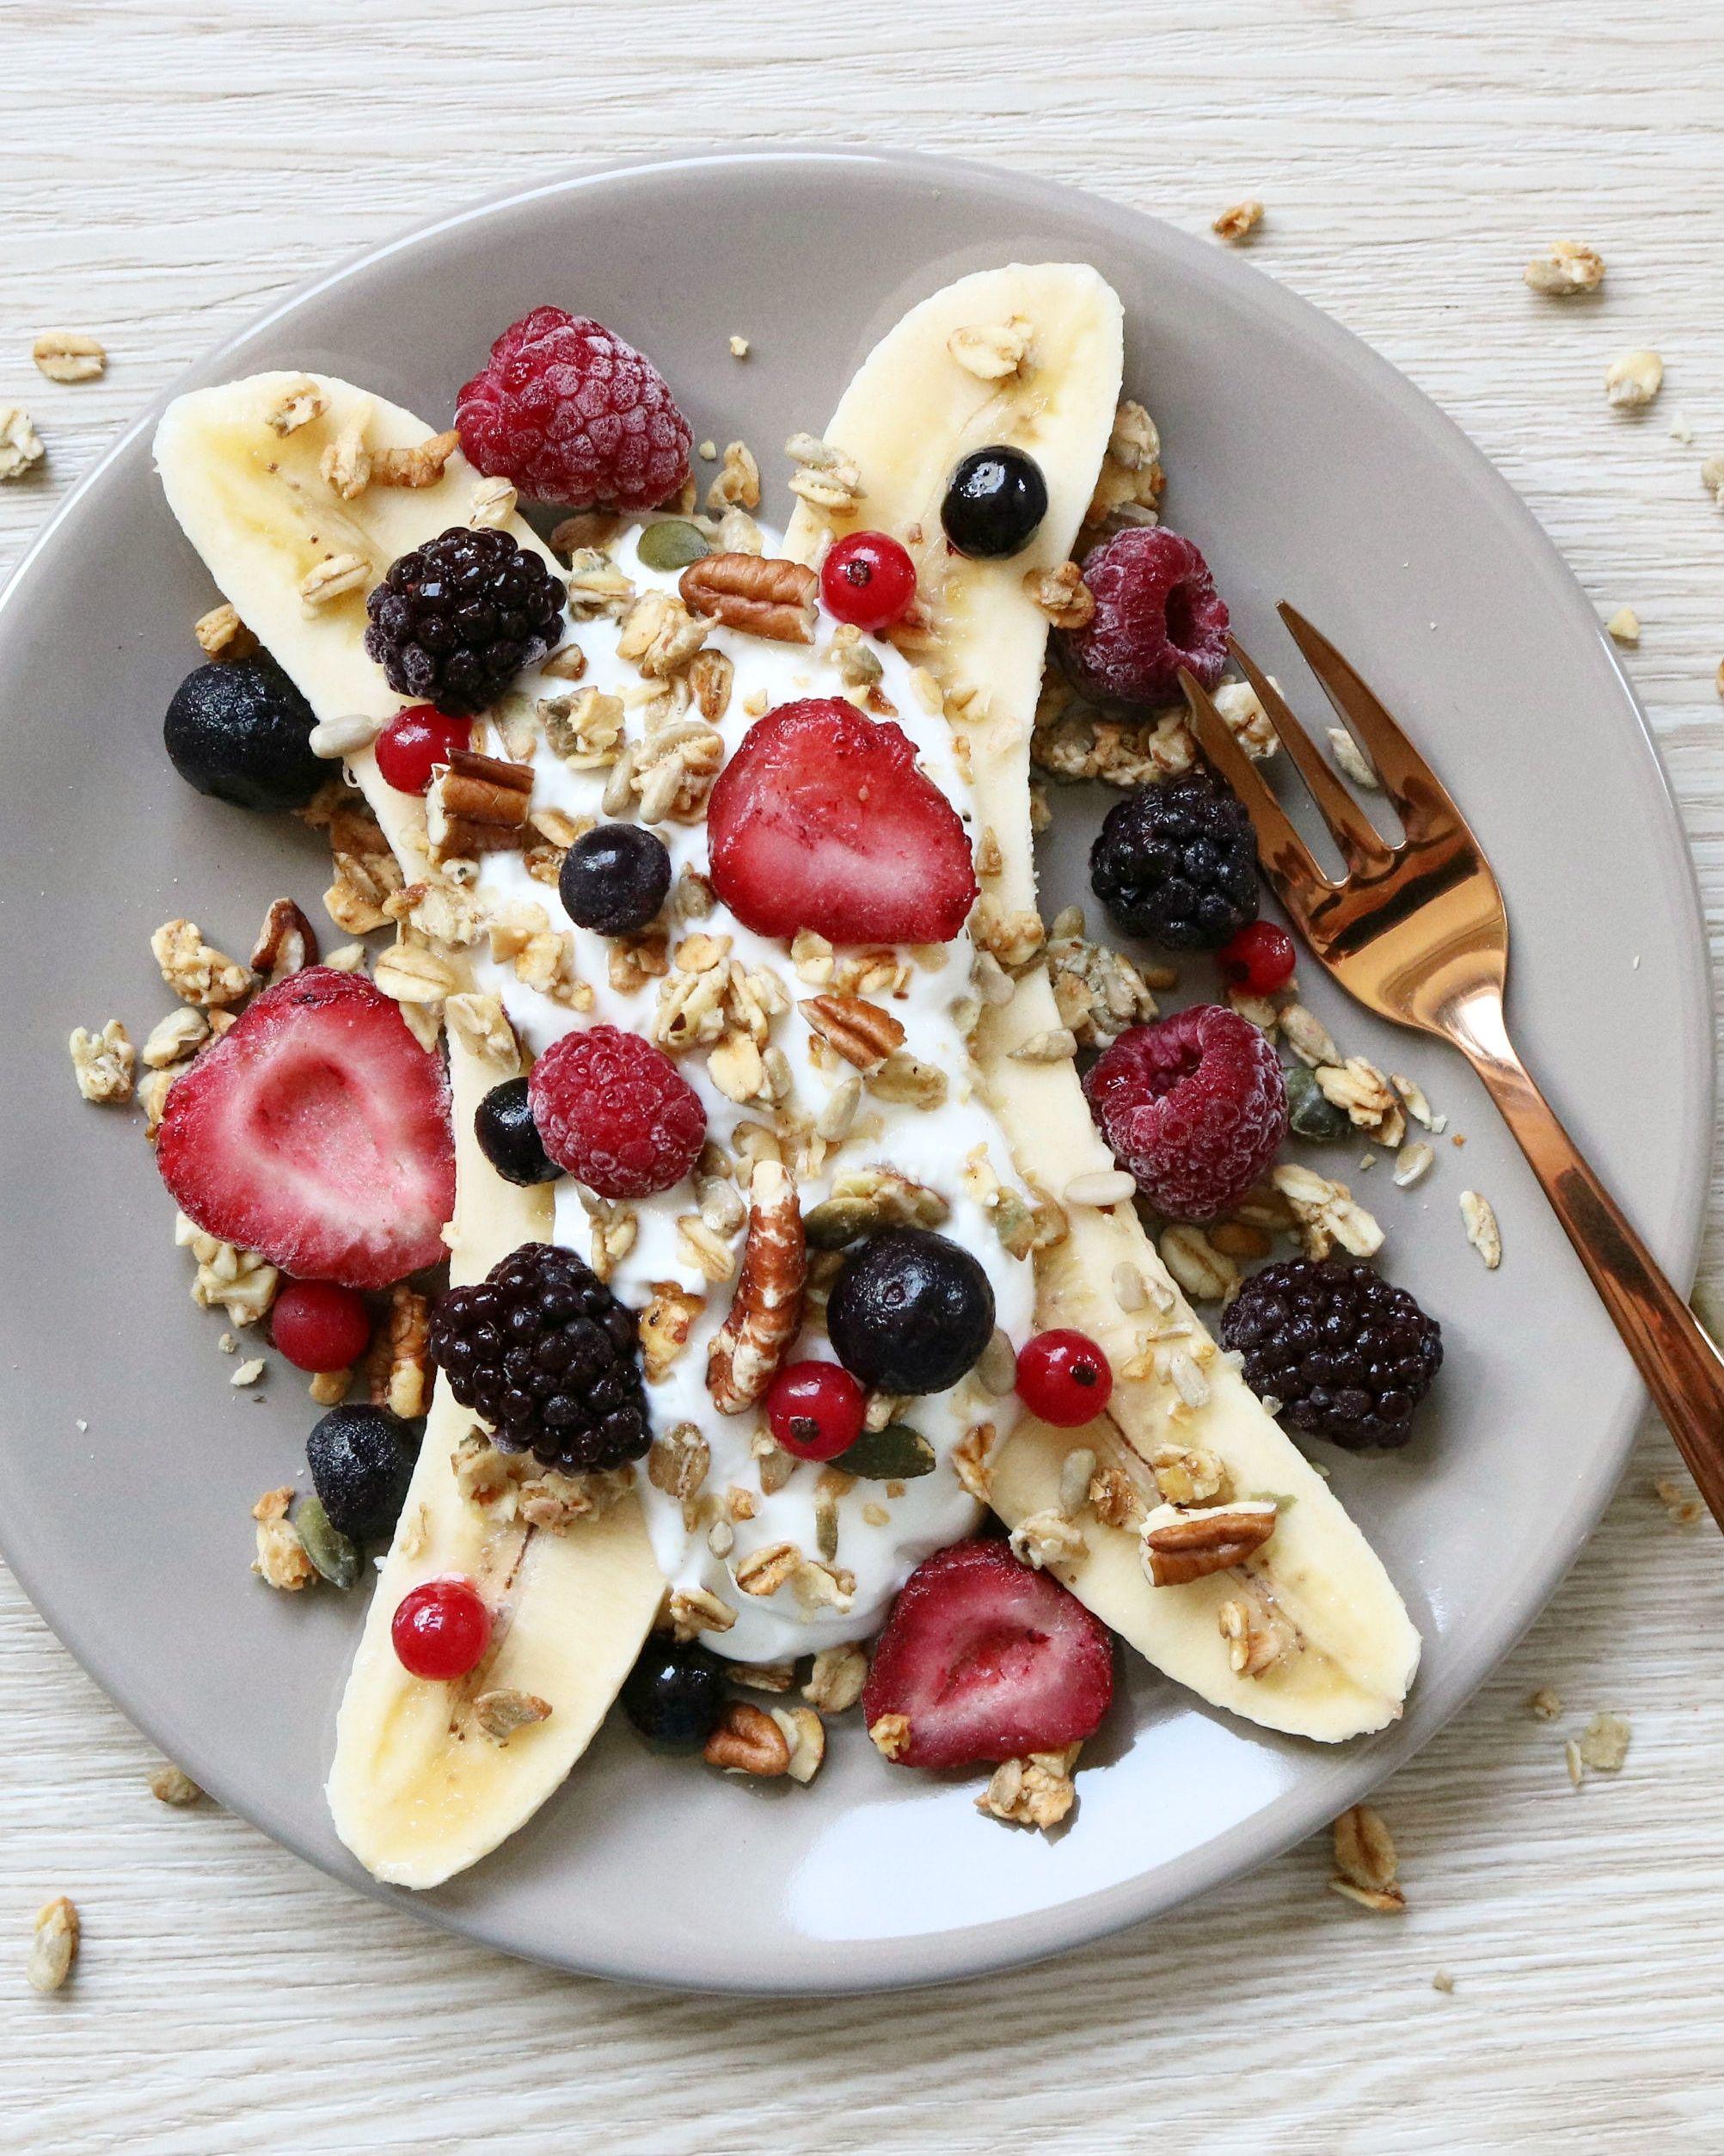 HEALTHY BANANEN SPLIT - #healthyfood